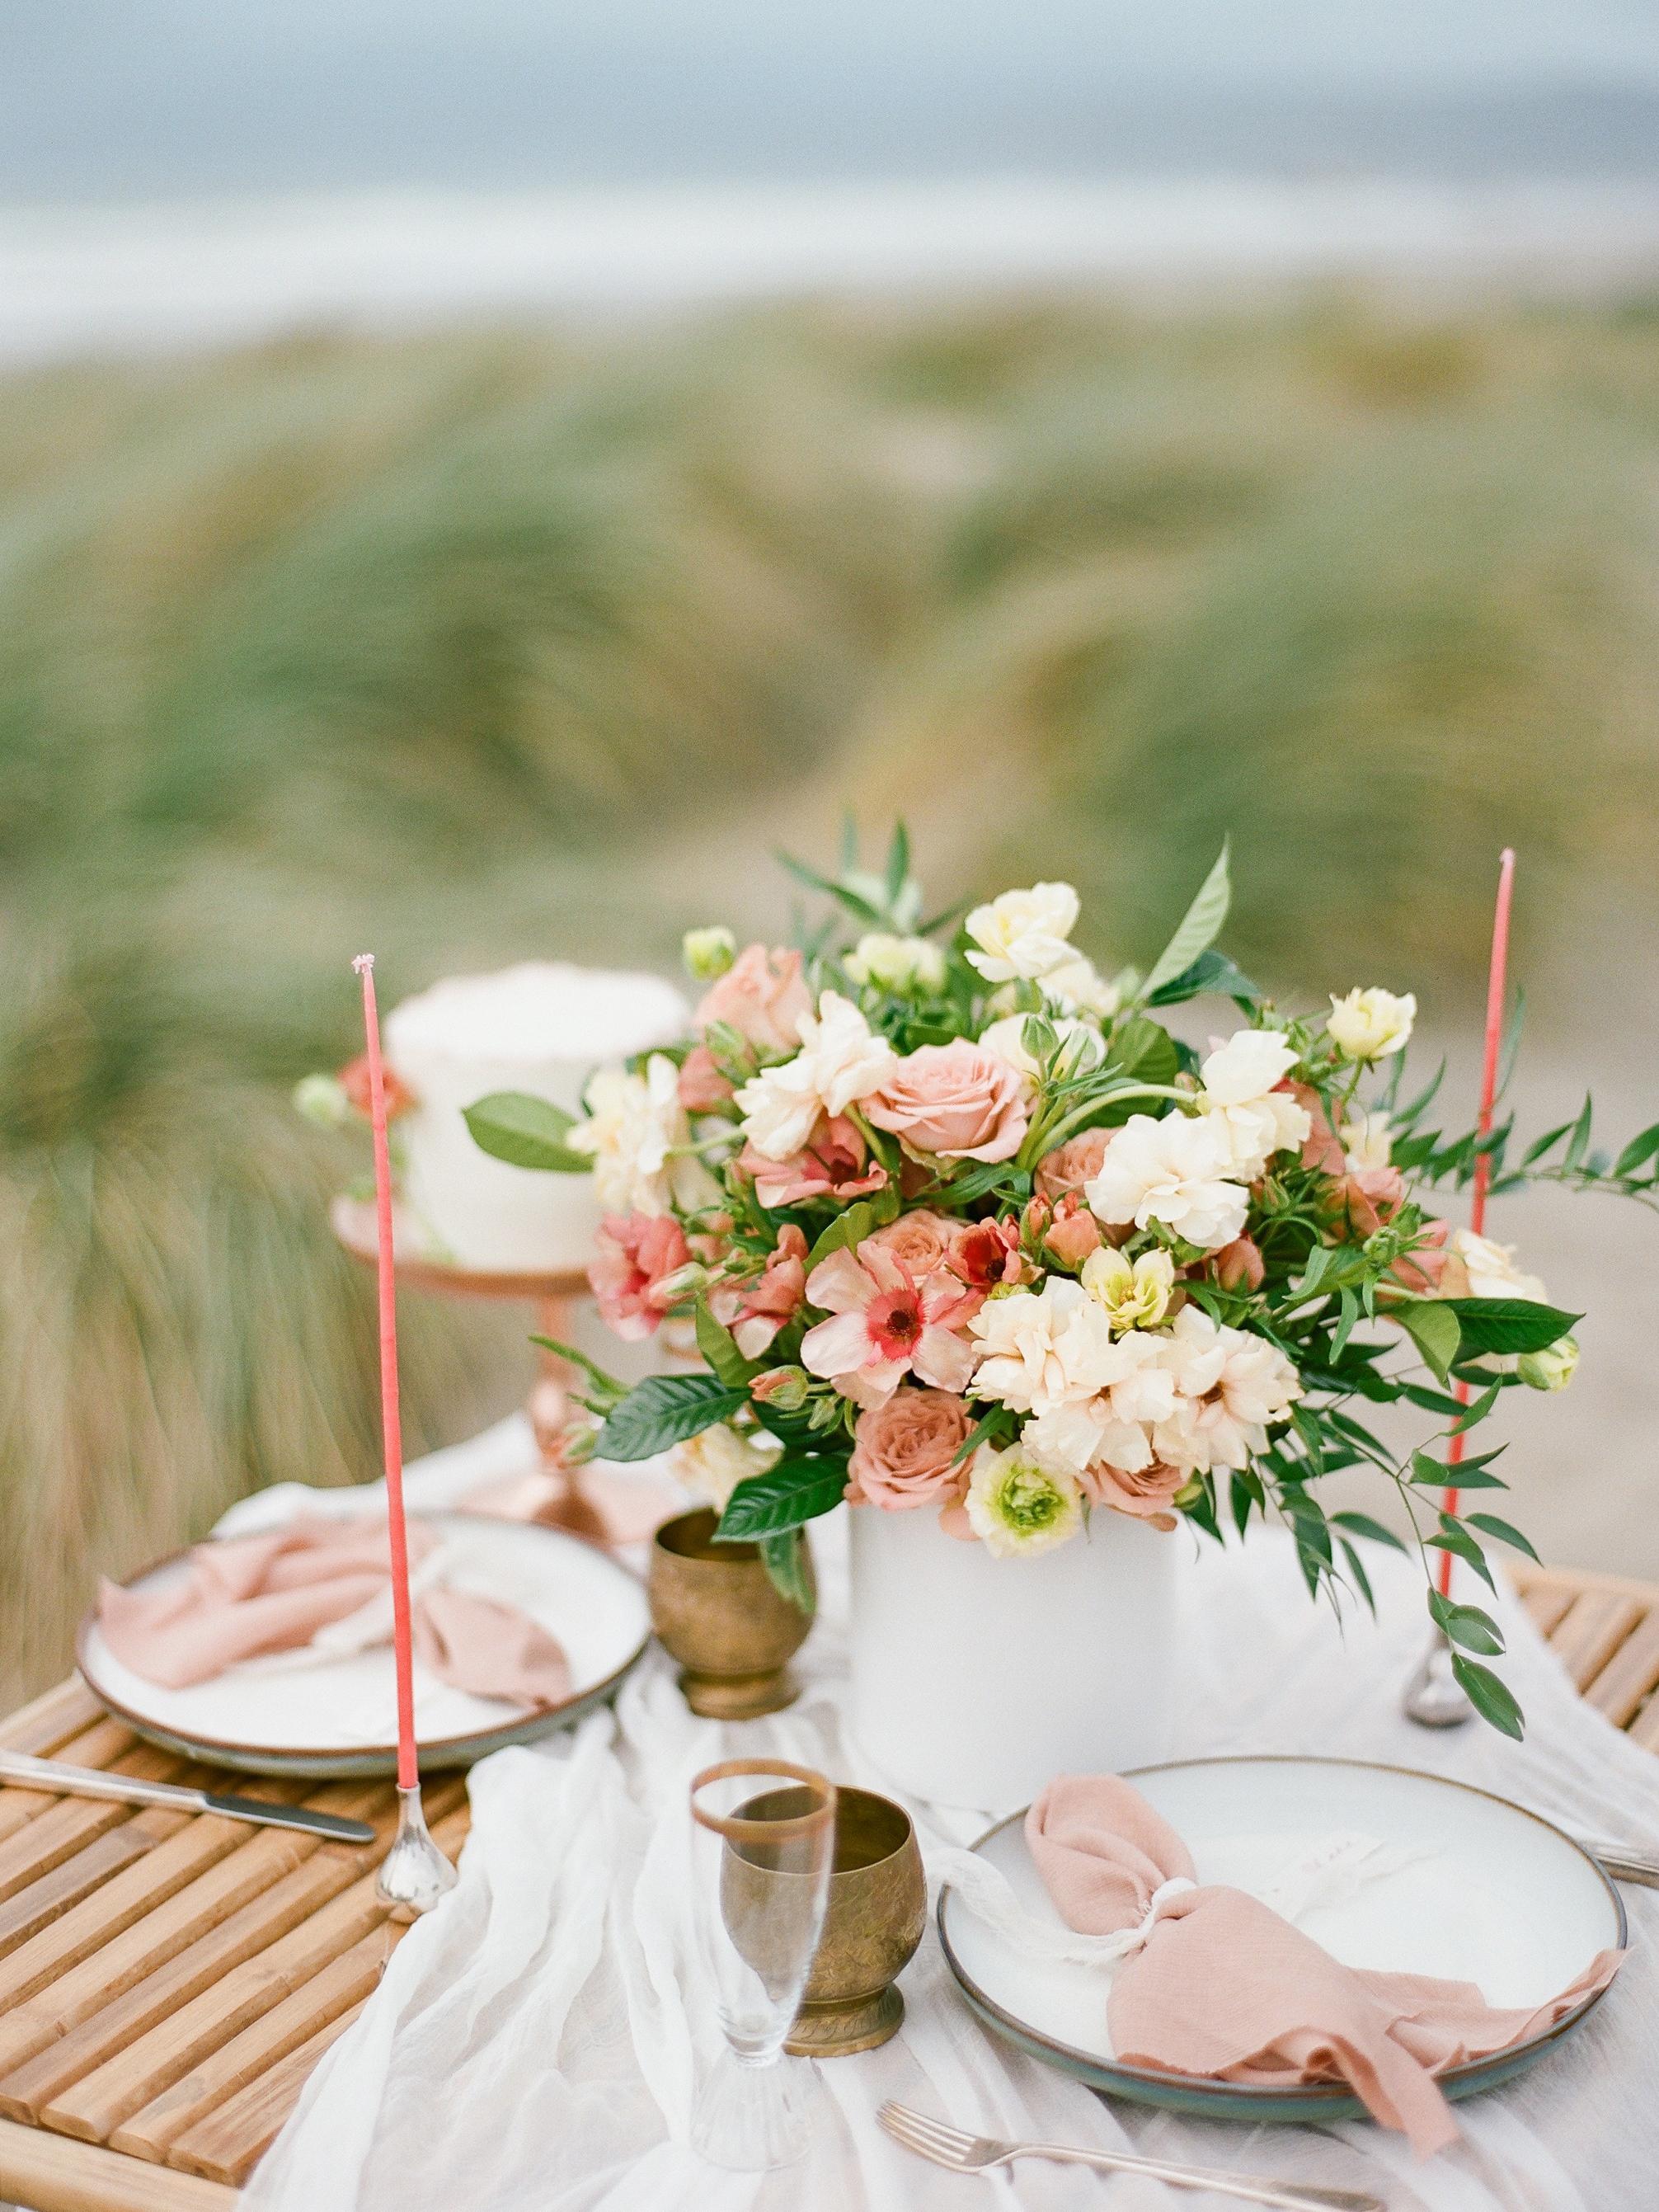 Muave wedding decor ideas